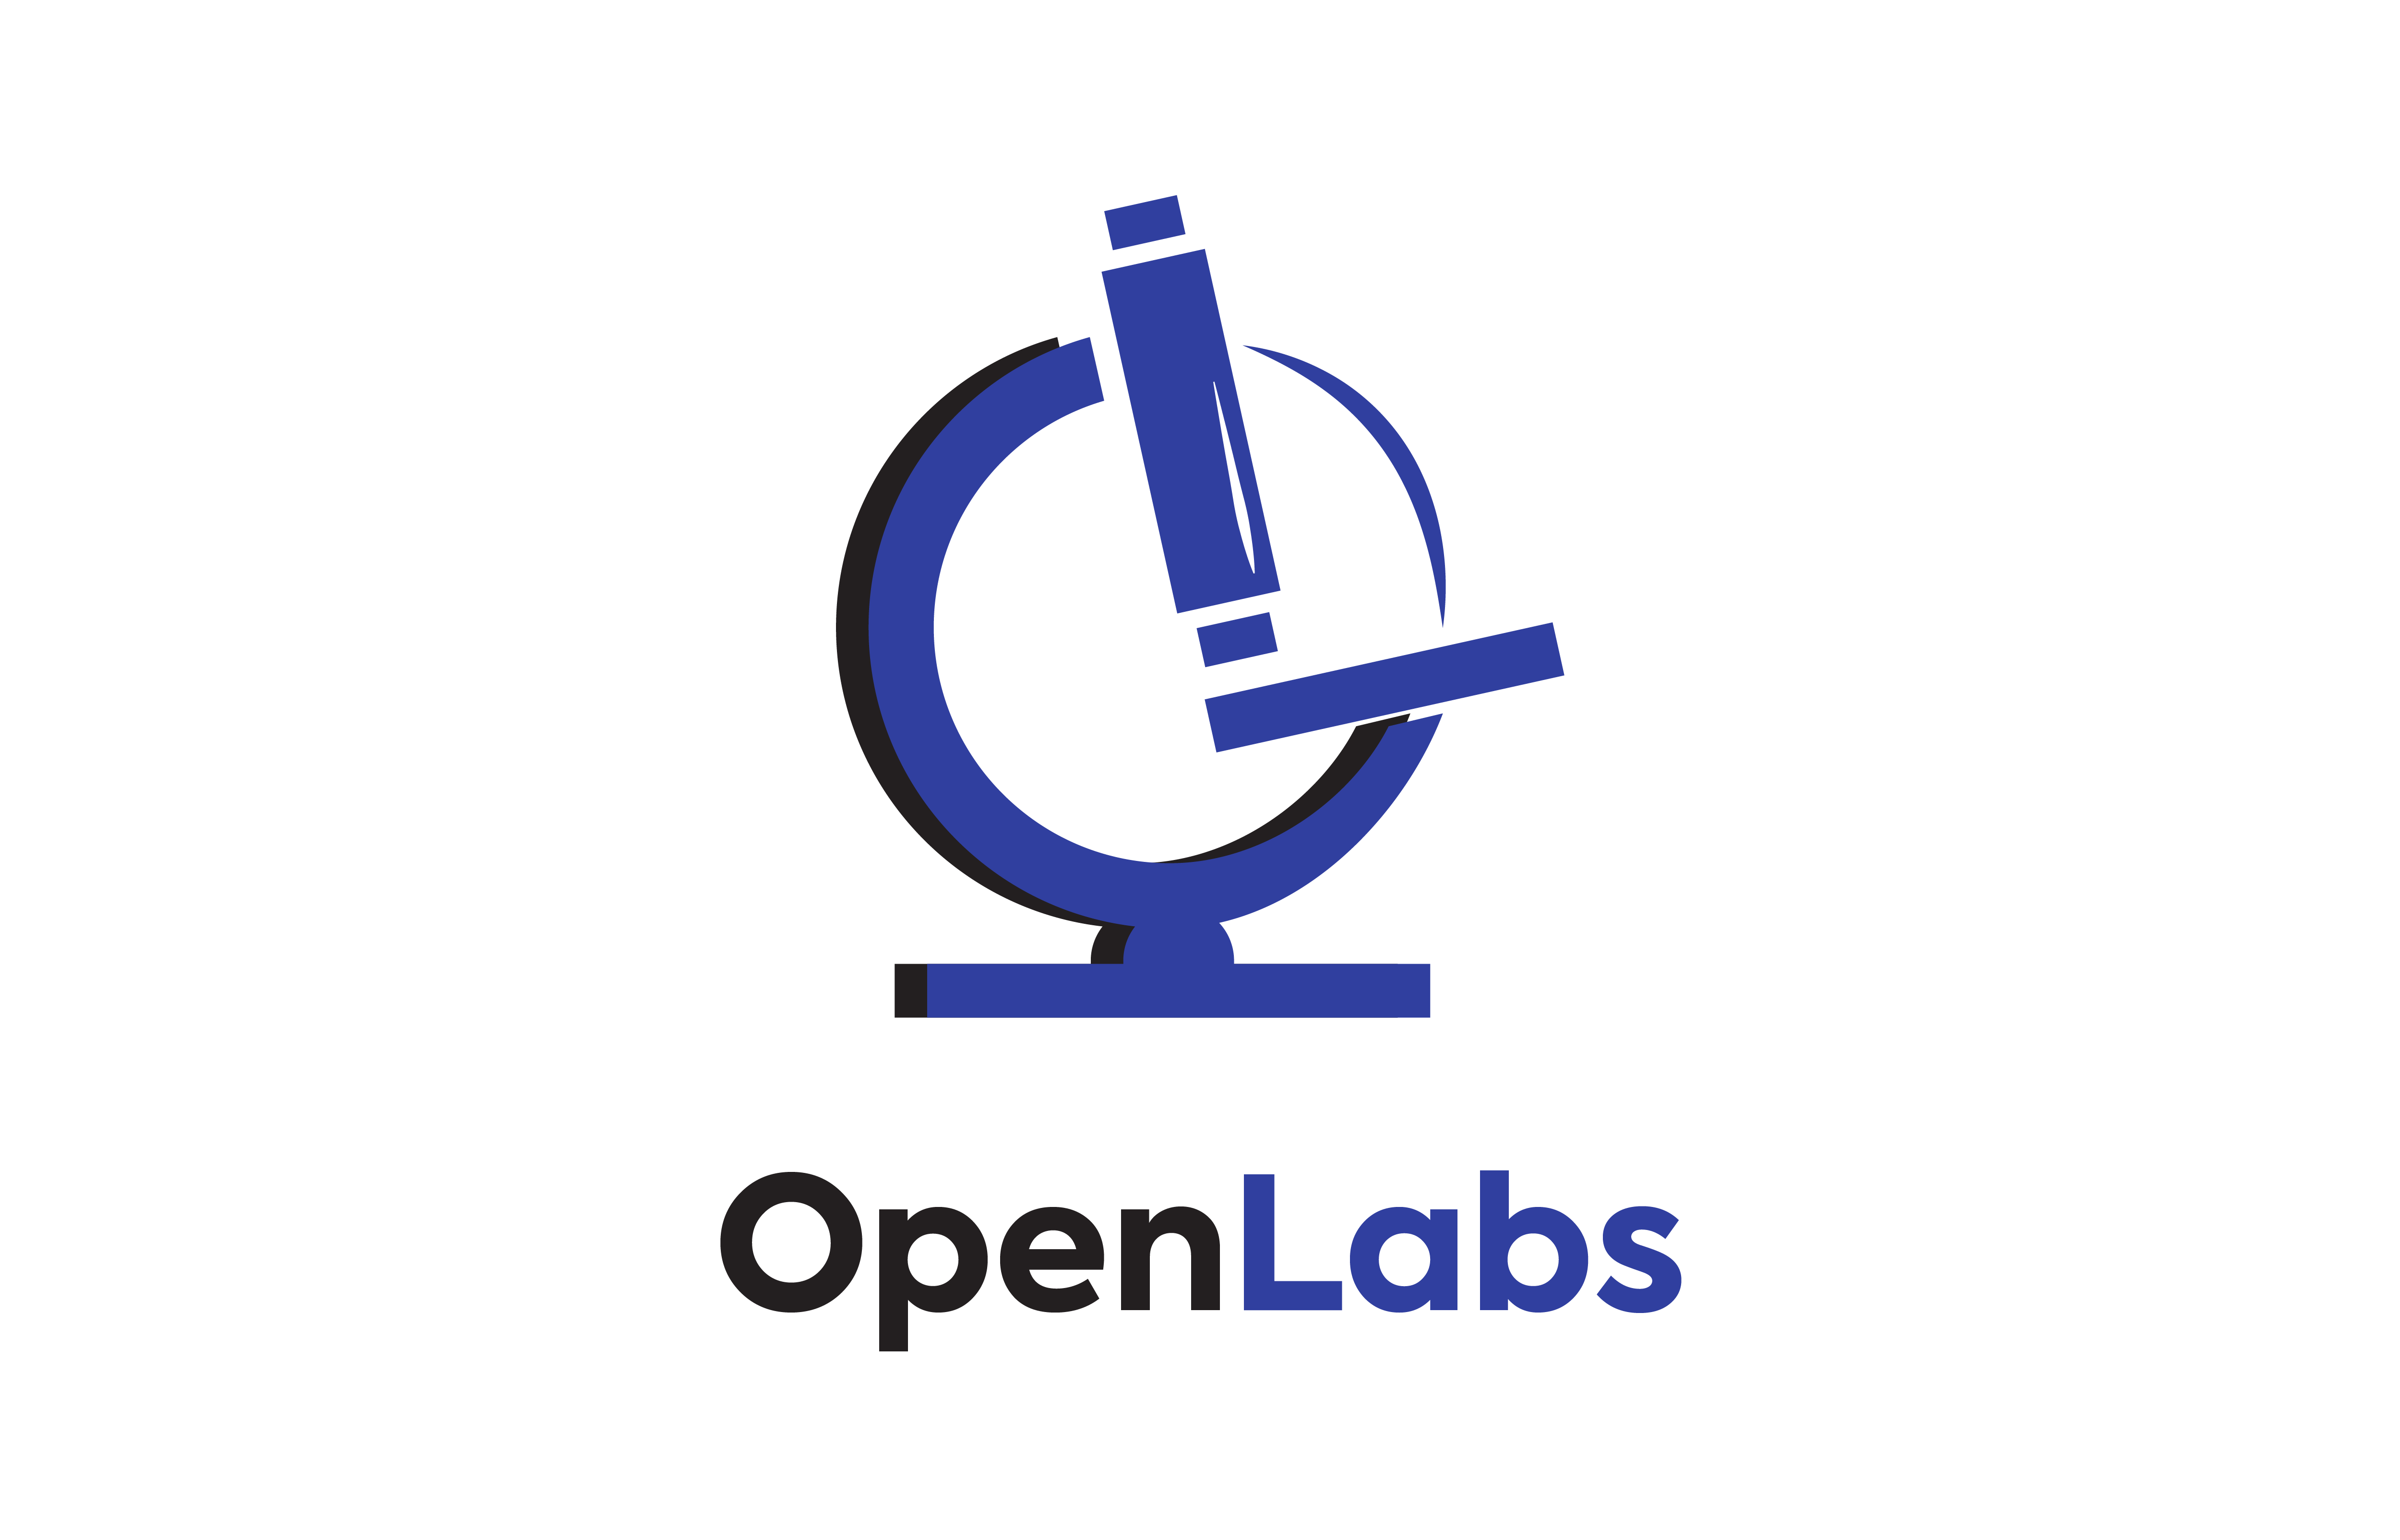 OpenLabs showcase